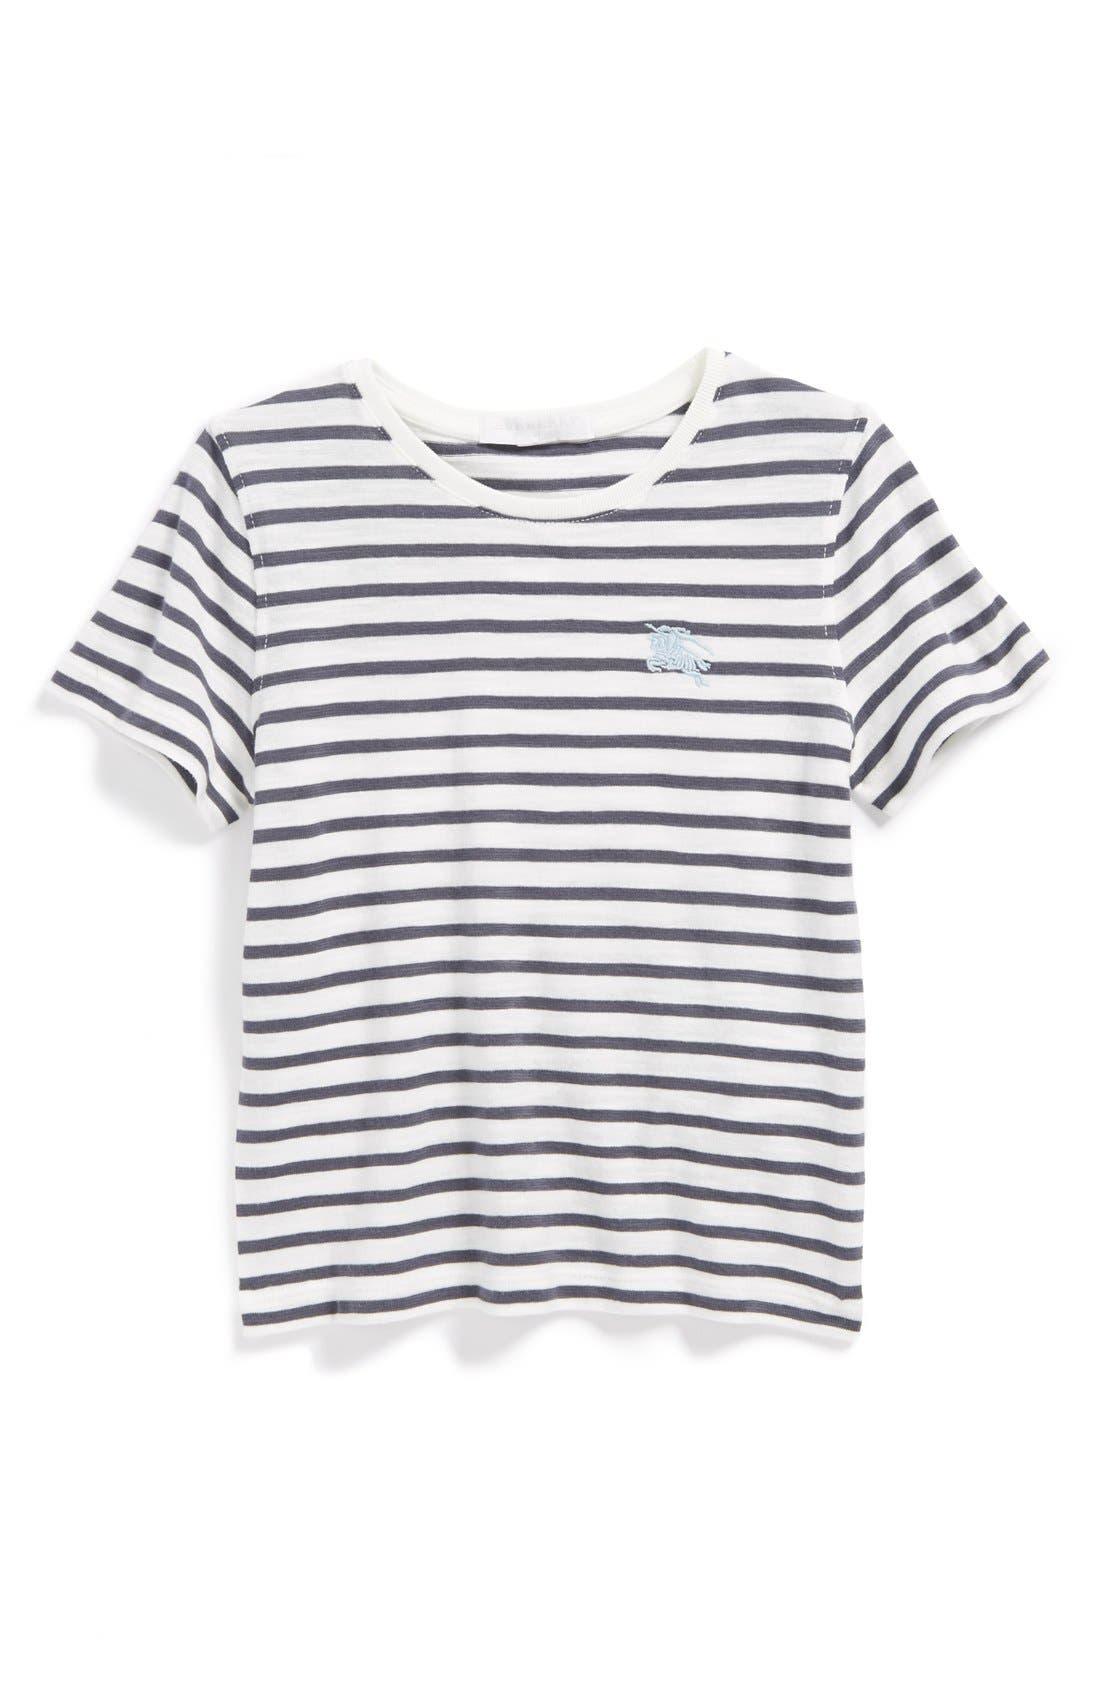 Alternate Image 1 Selected - Burberry Stripe T-Shirt (Little Boys & Big Boys)